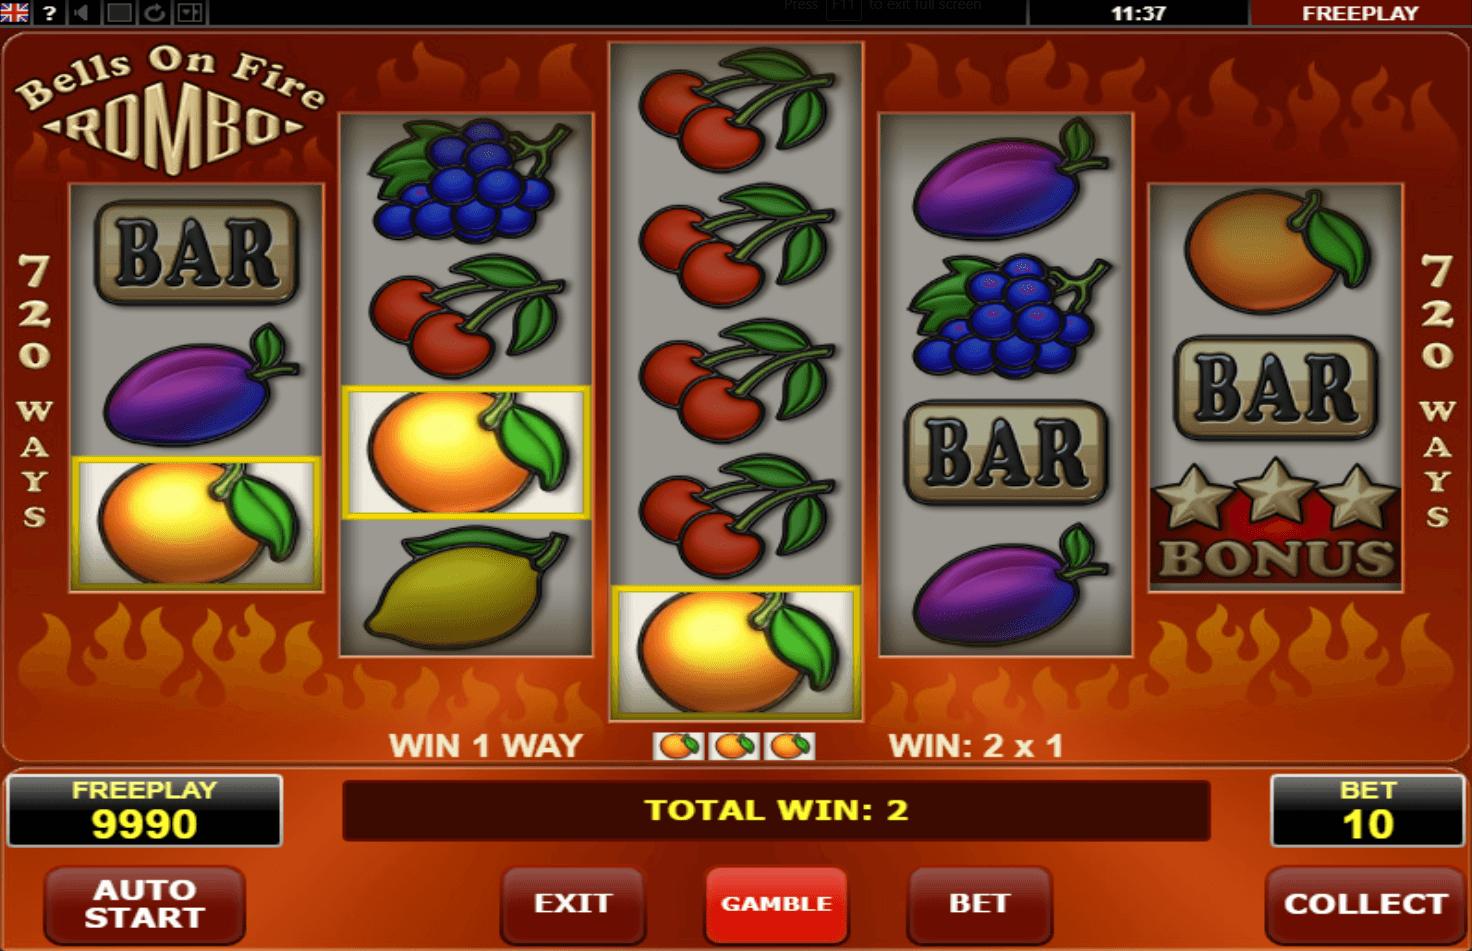 Free Slot Video Games Bonus